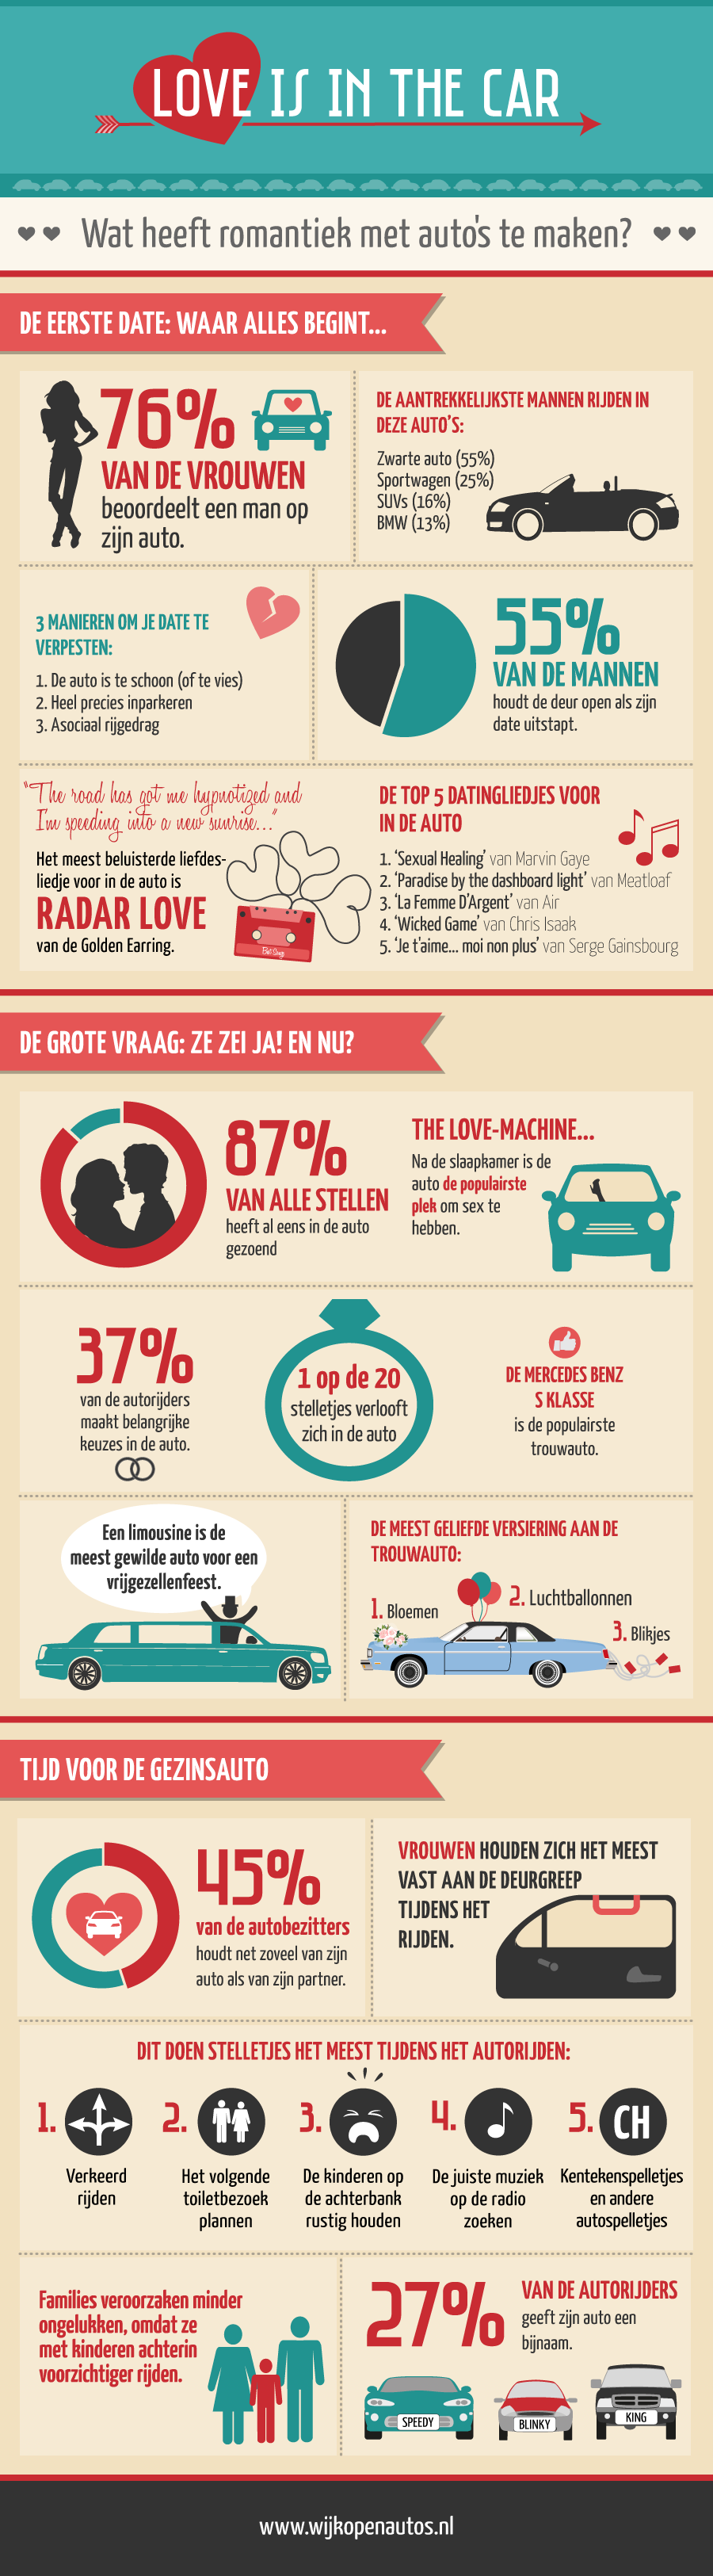 infographic_valentinesday_nl